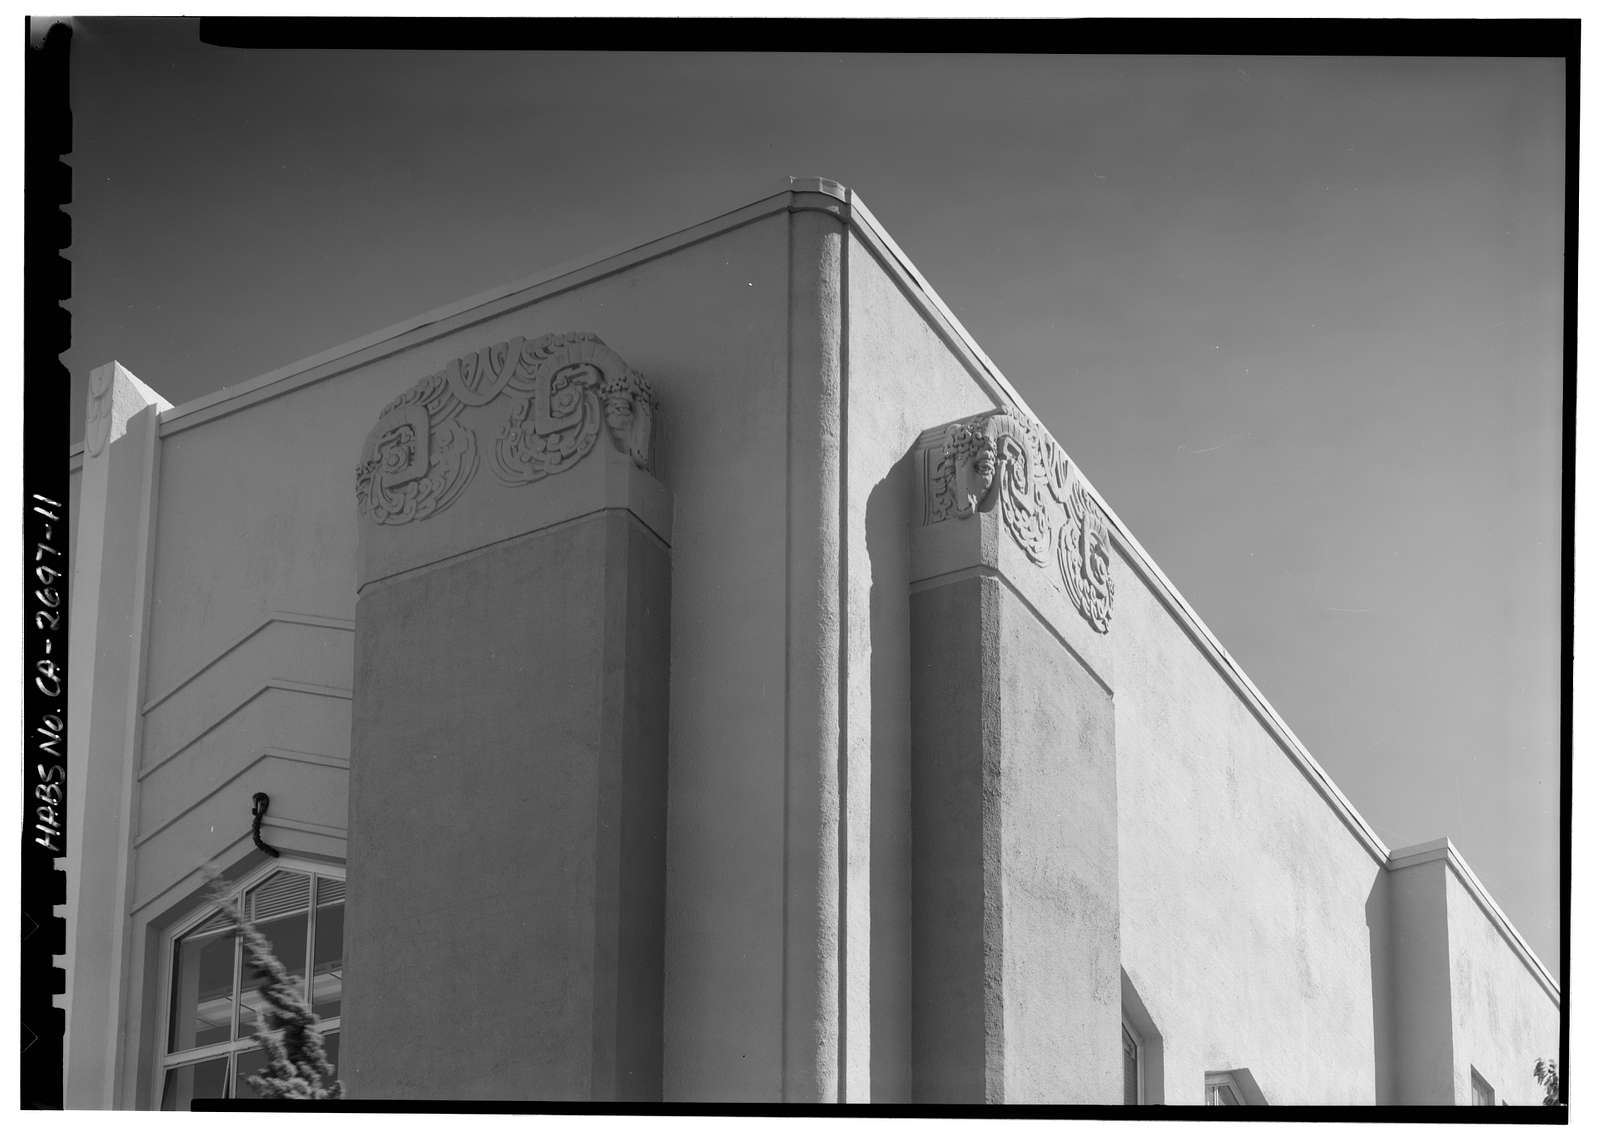 Berkeley Public Library, 2090 Kittredge Street, Berkeley, Alameda County, CA